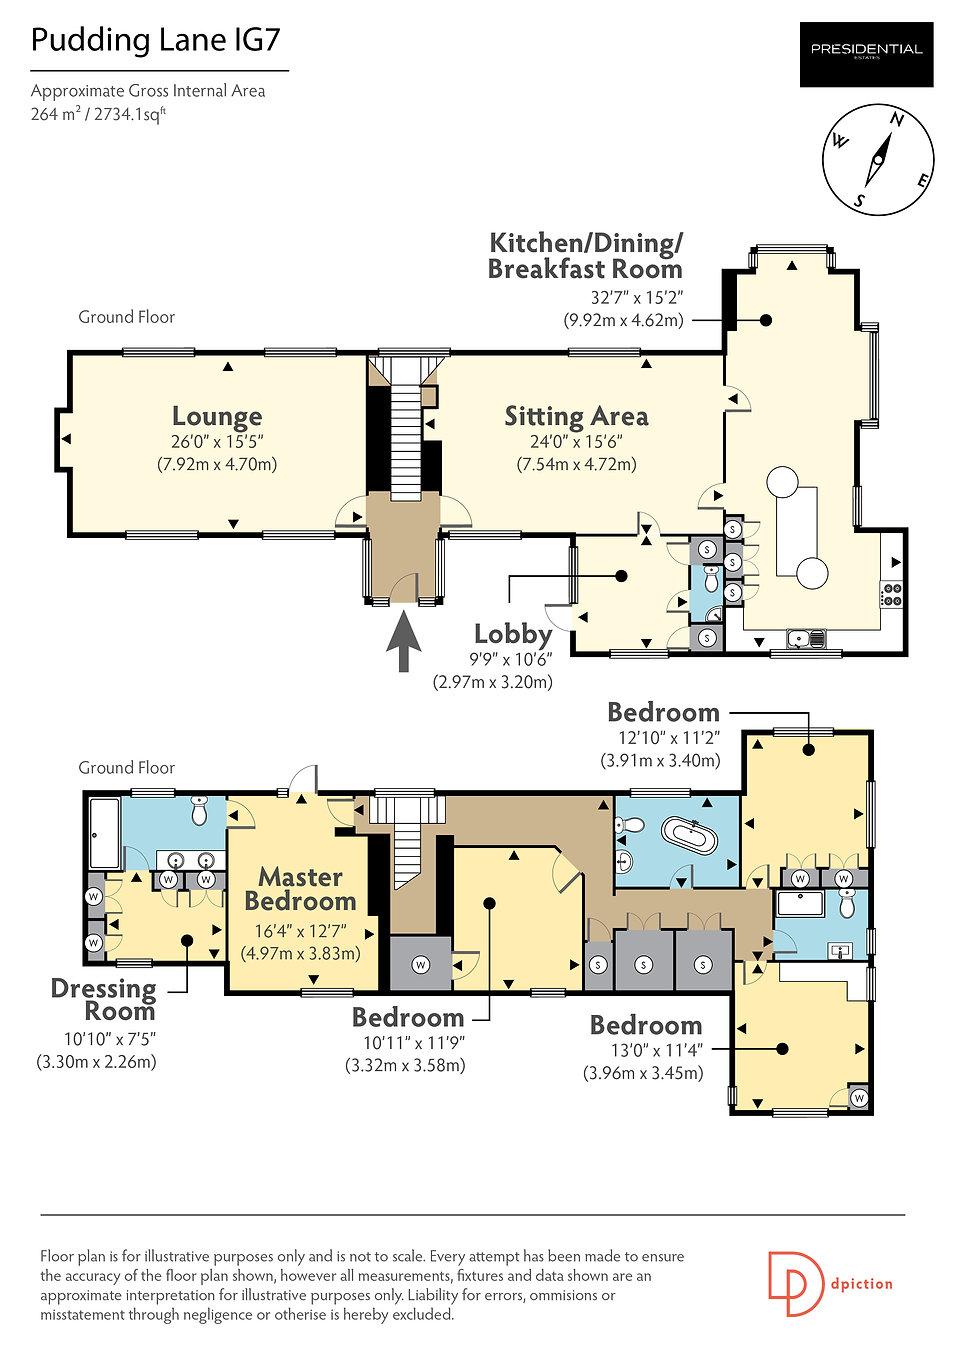 35_Floor Plan Pudding Lane IG7-01.jpg